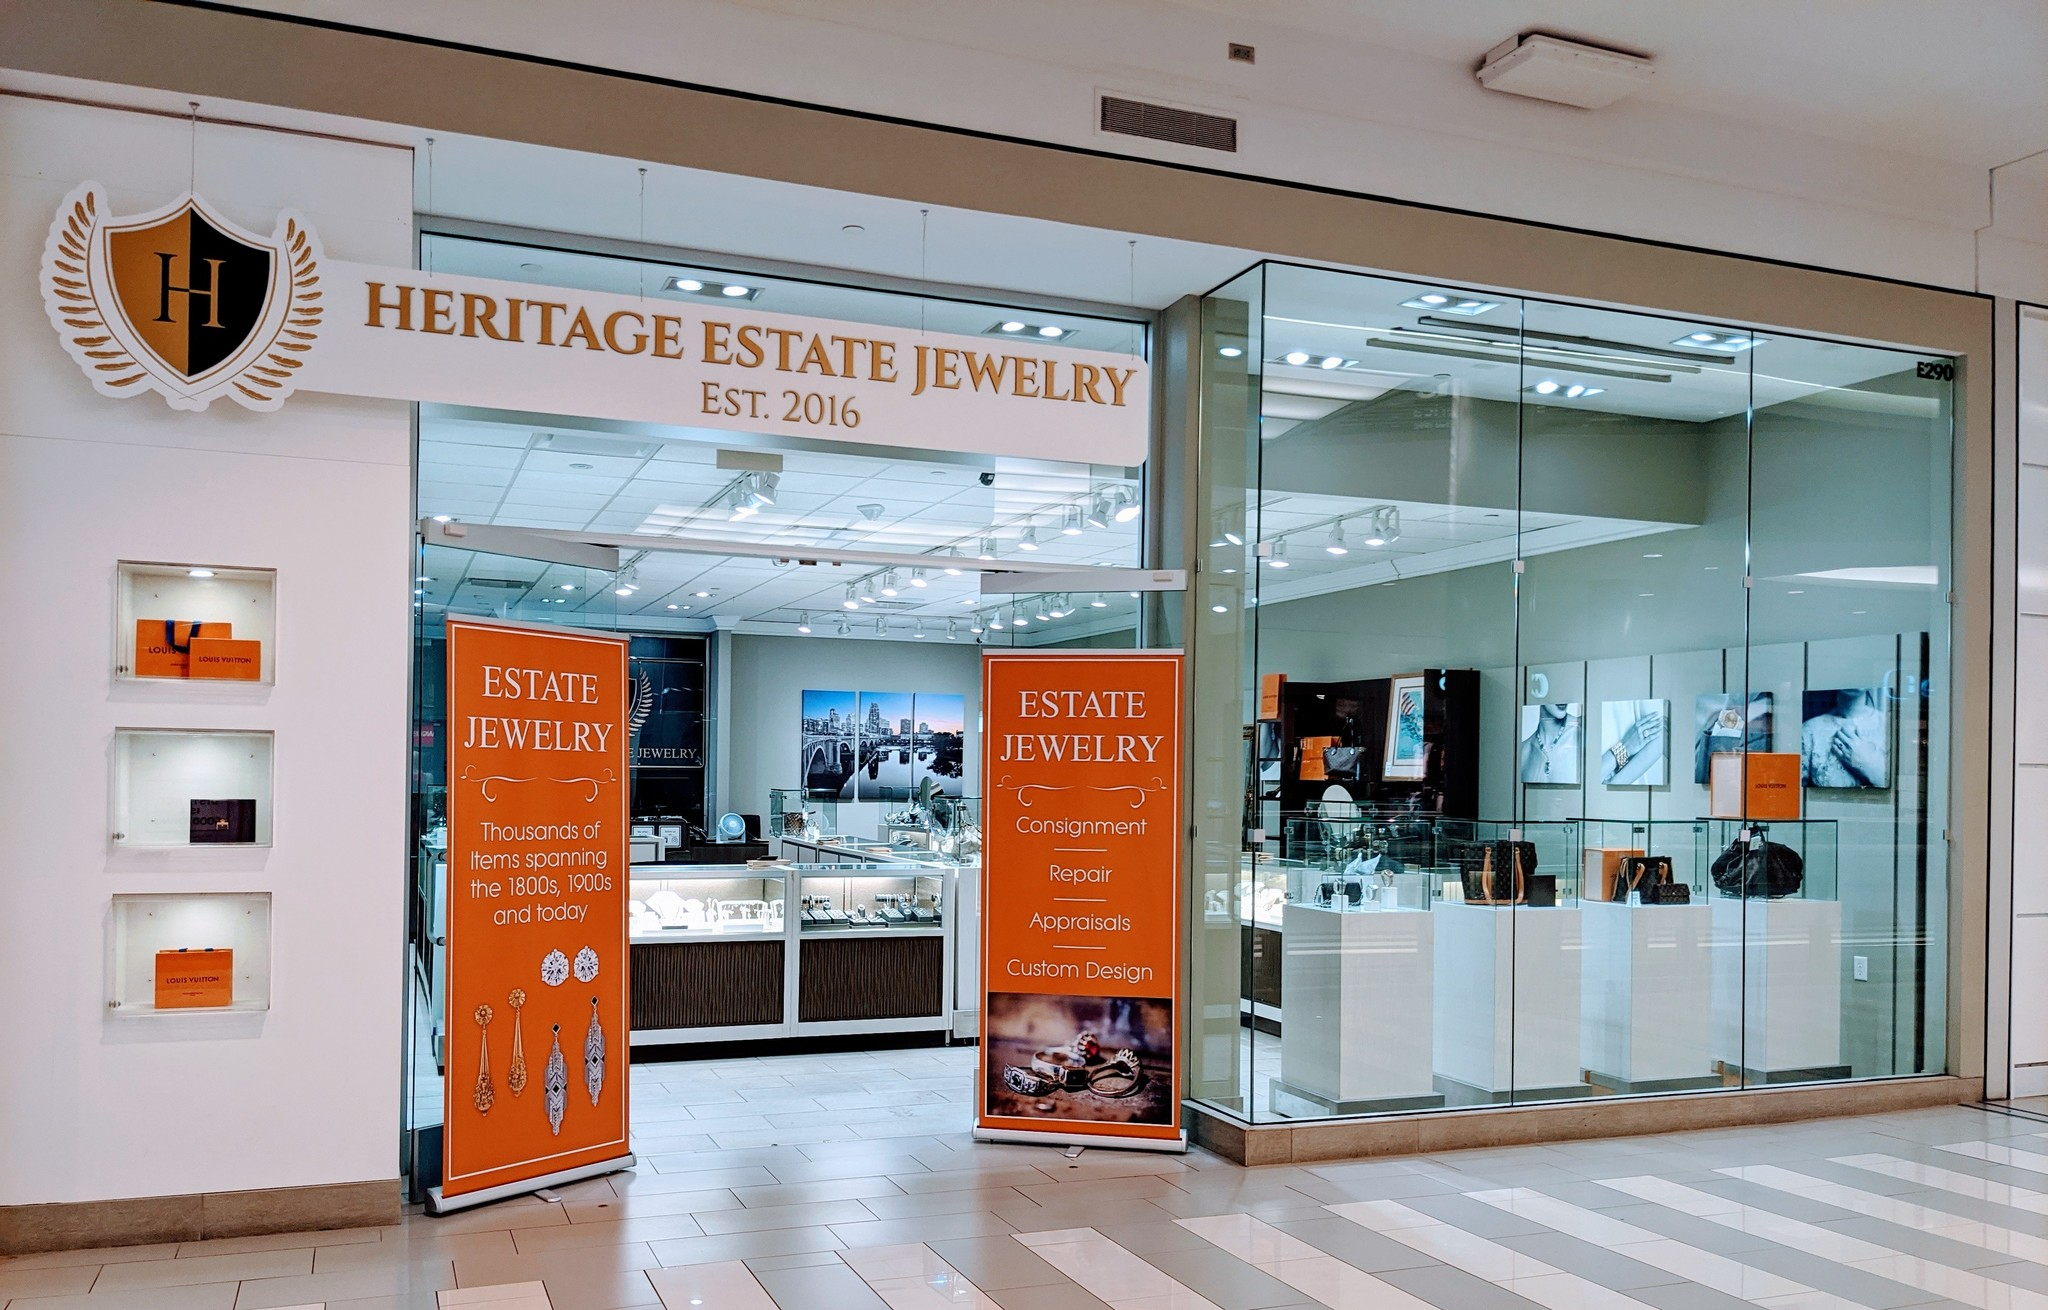 Heritage Estate Jewelry